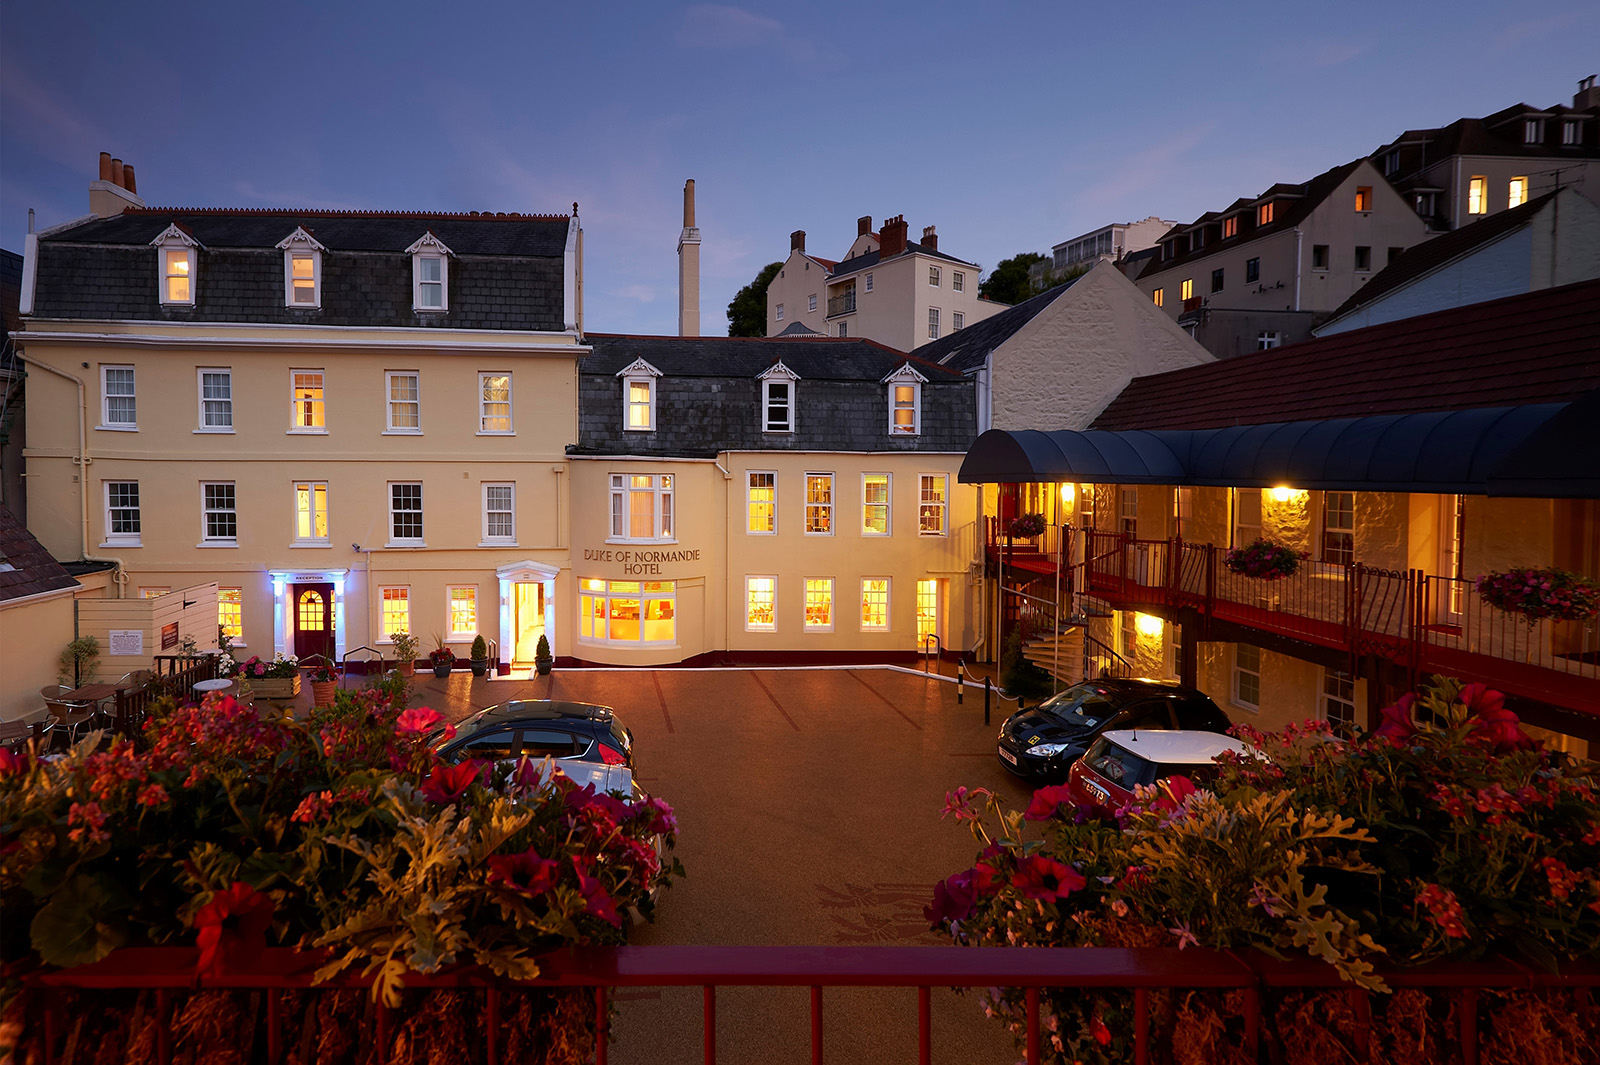 The Duke Of Normandie Hotel Best 3 Star Hotel In Guernsey Duke Of Normandie Hotel